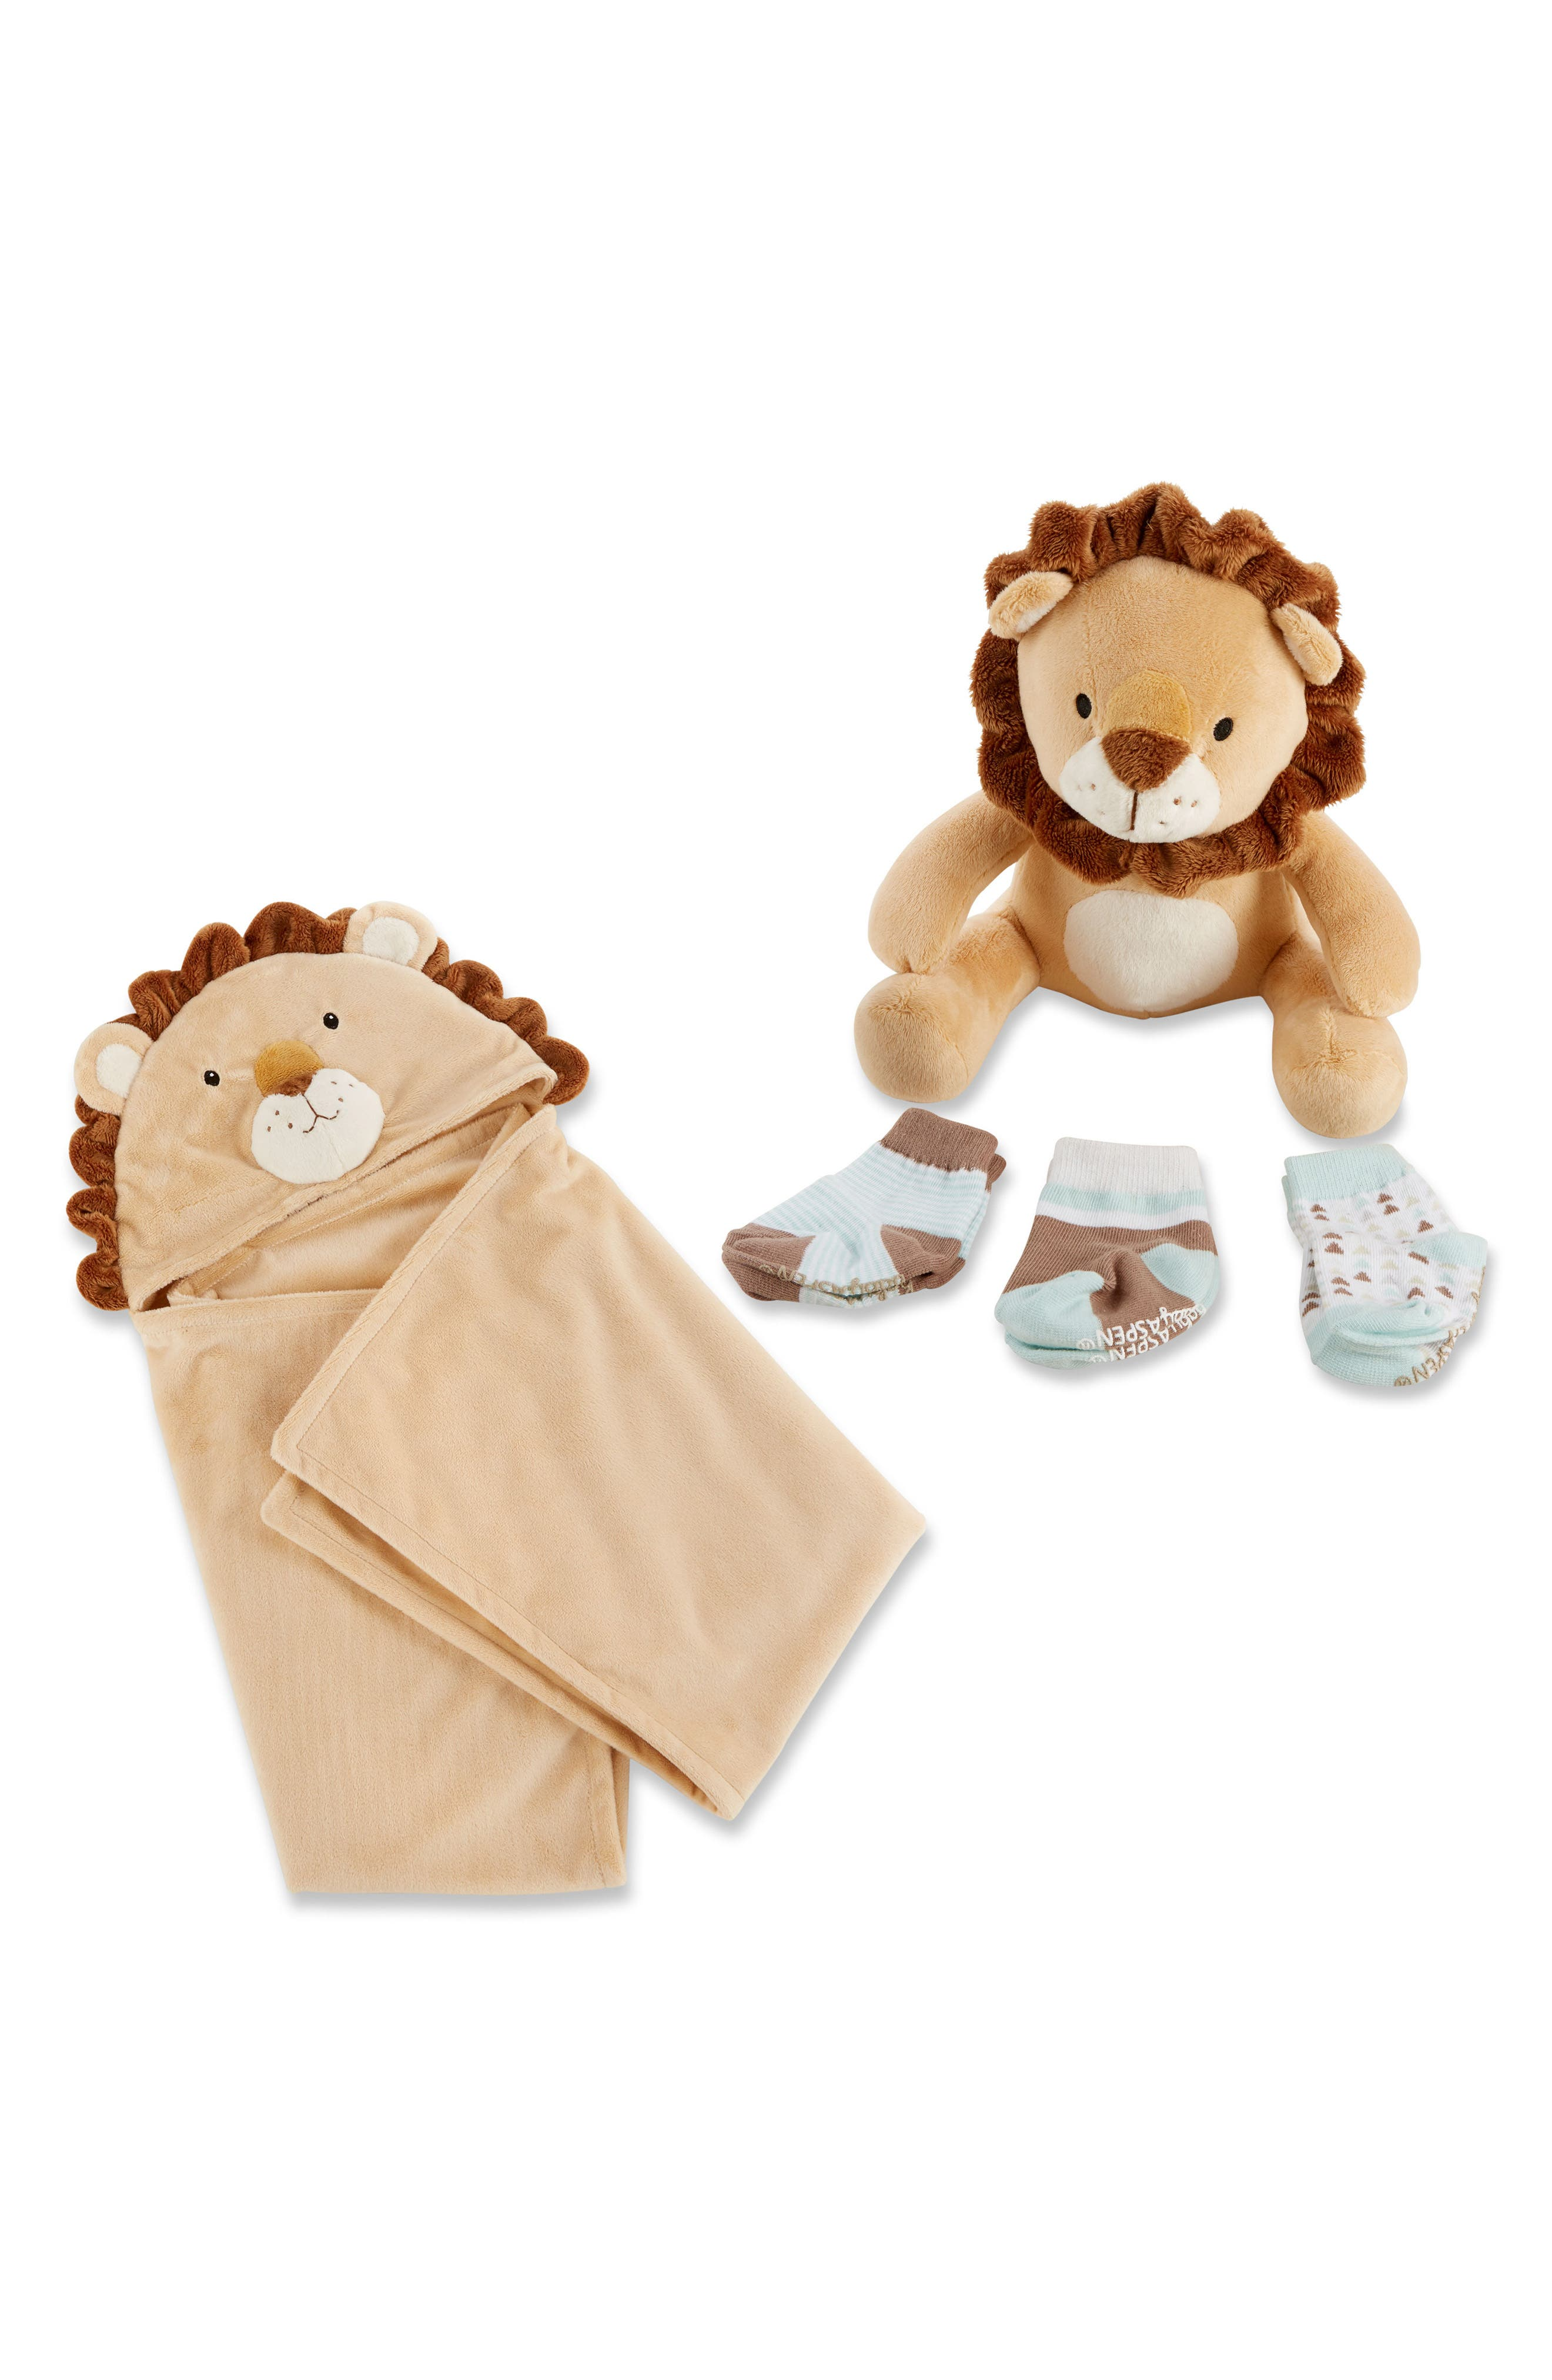 Baby Aspen Lion Hooded Blanket Tan//Brown//Beige